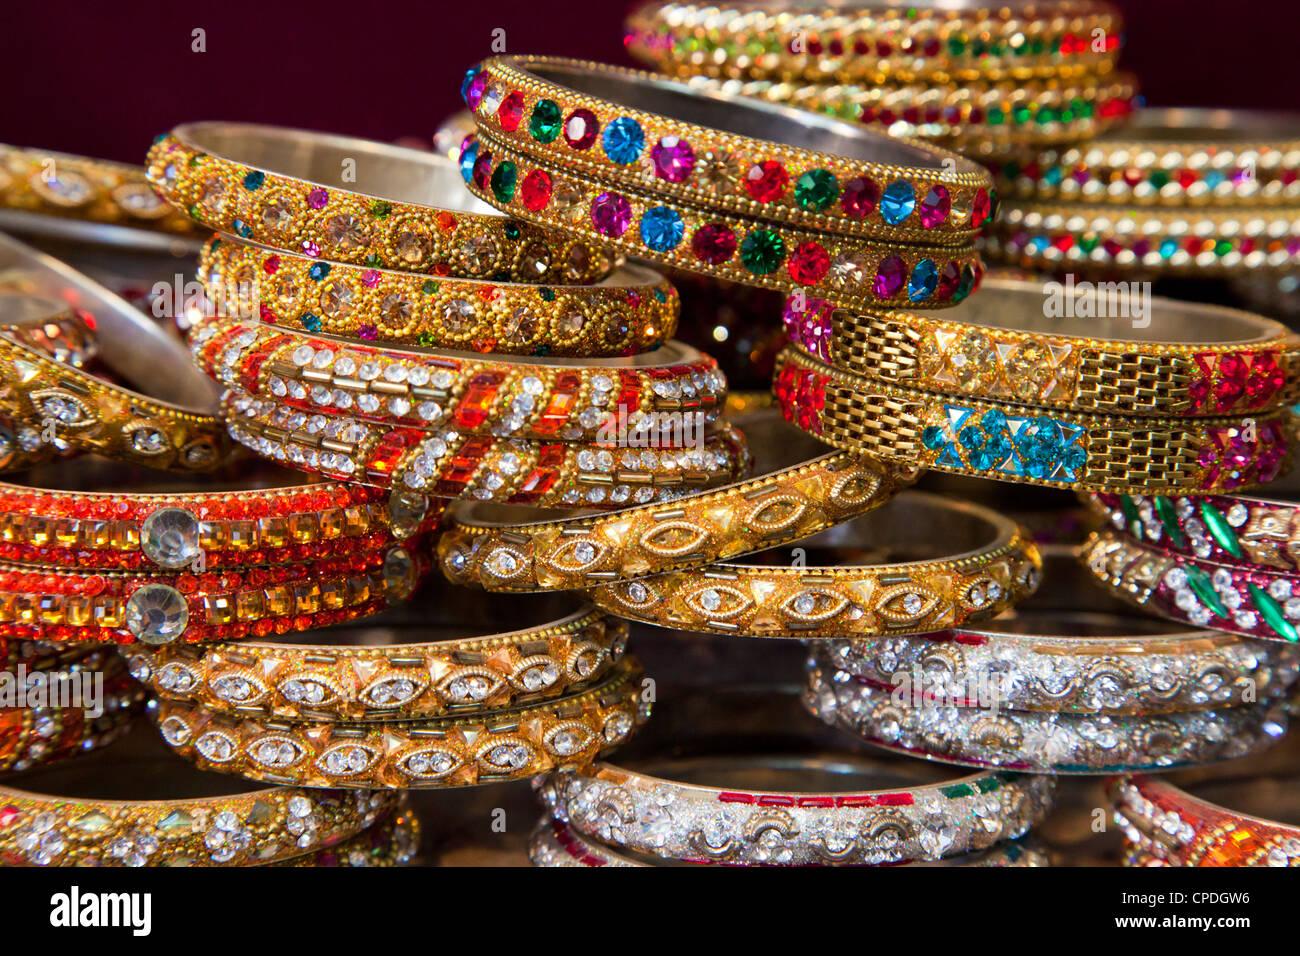 Braclets colorati per la vendita in un negozio di Jaipur, Rajasthan, India, Asia Immagini Stock